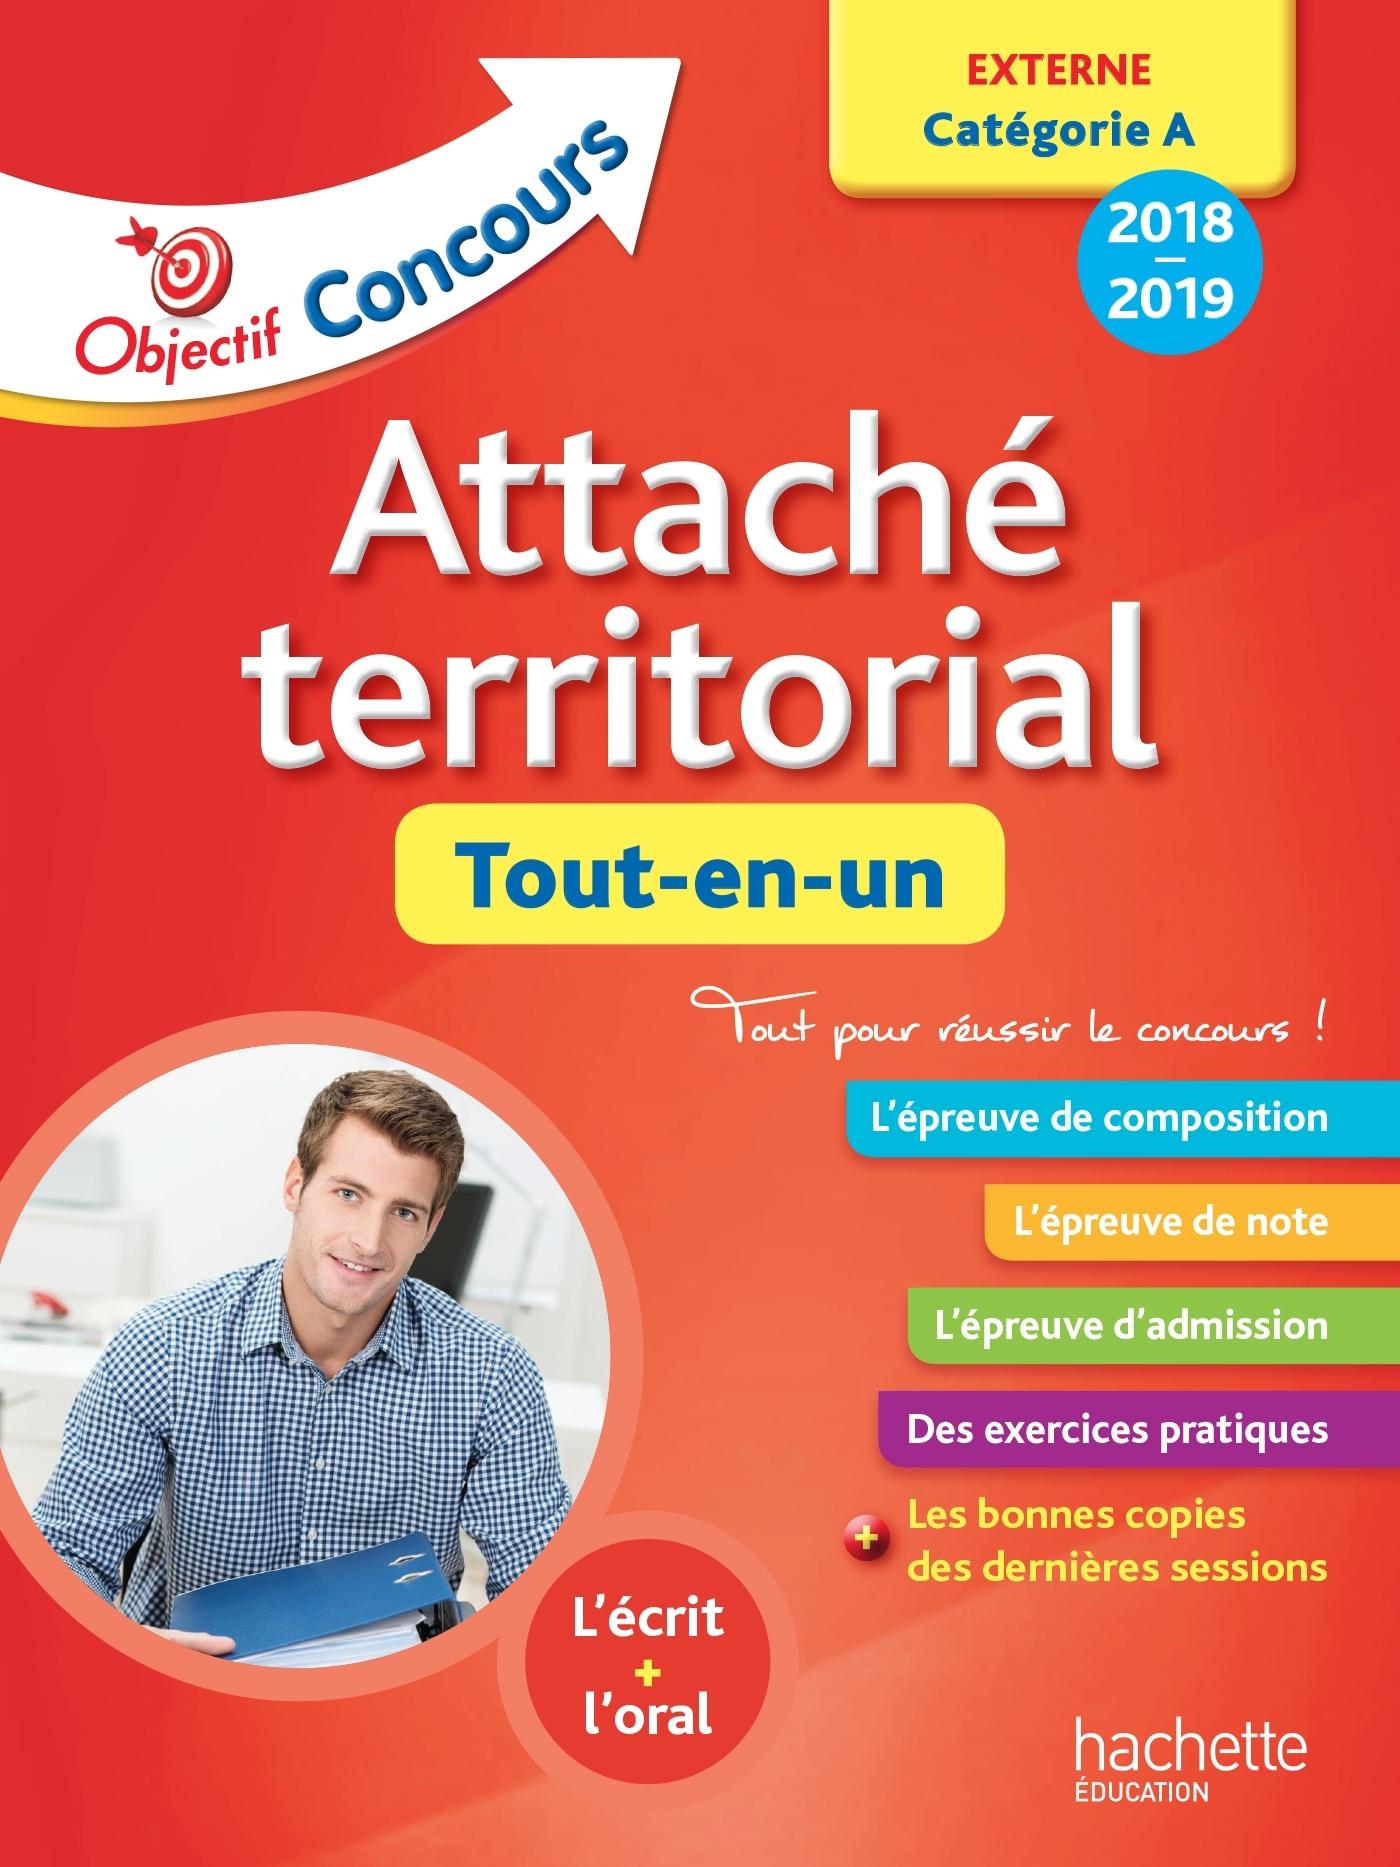 OBJECTIF CONCOURS 2018 ATTACHE TERRITORIAL (CONCOURS EXTERNE)